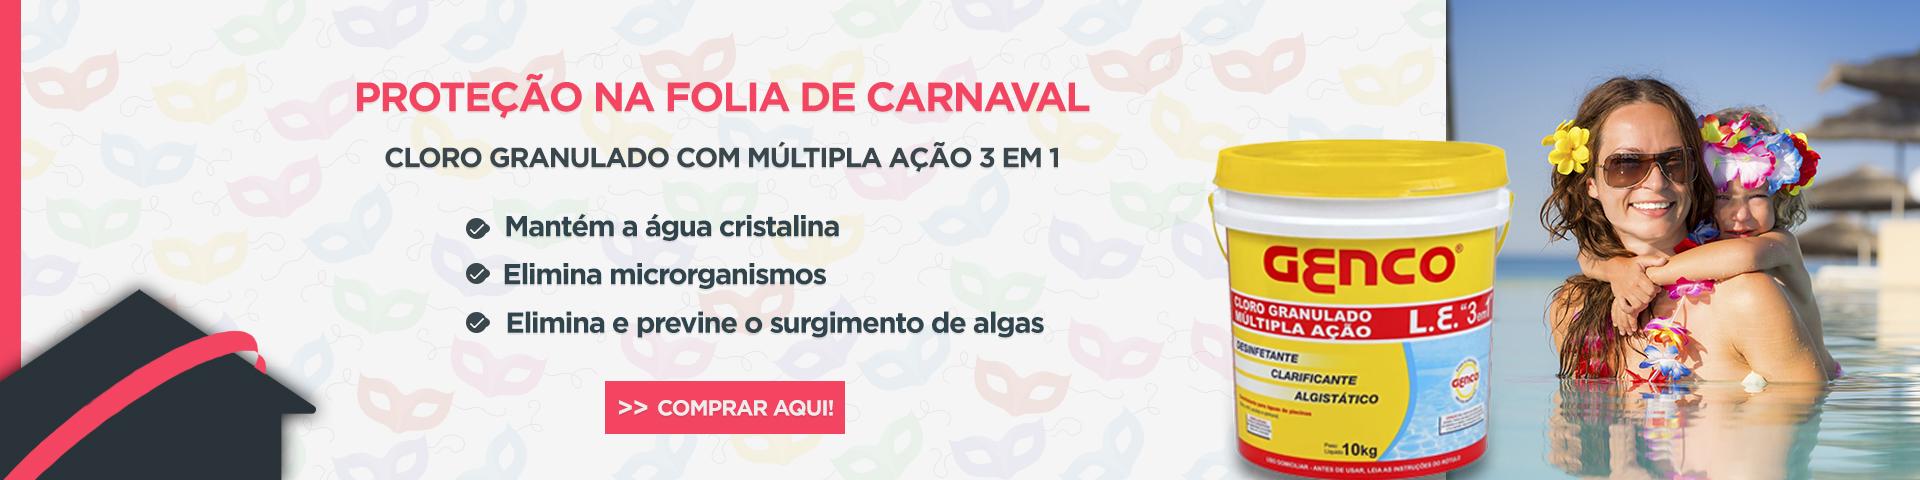 Banner Genco Carnaval